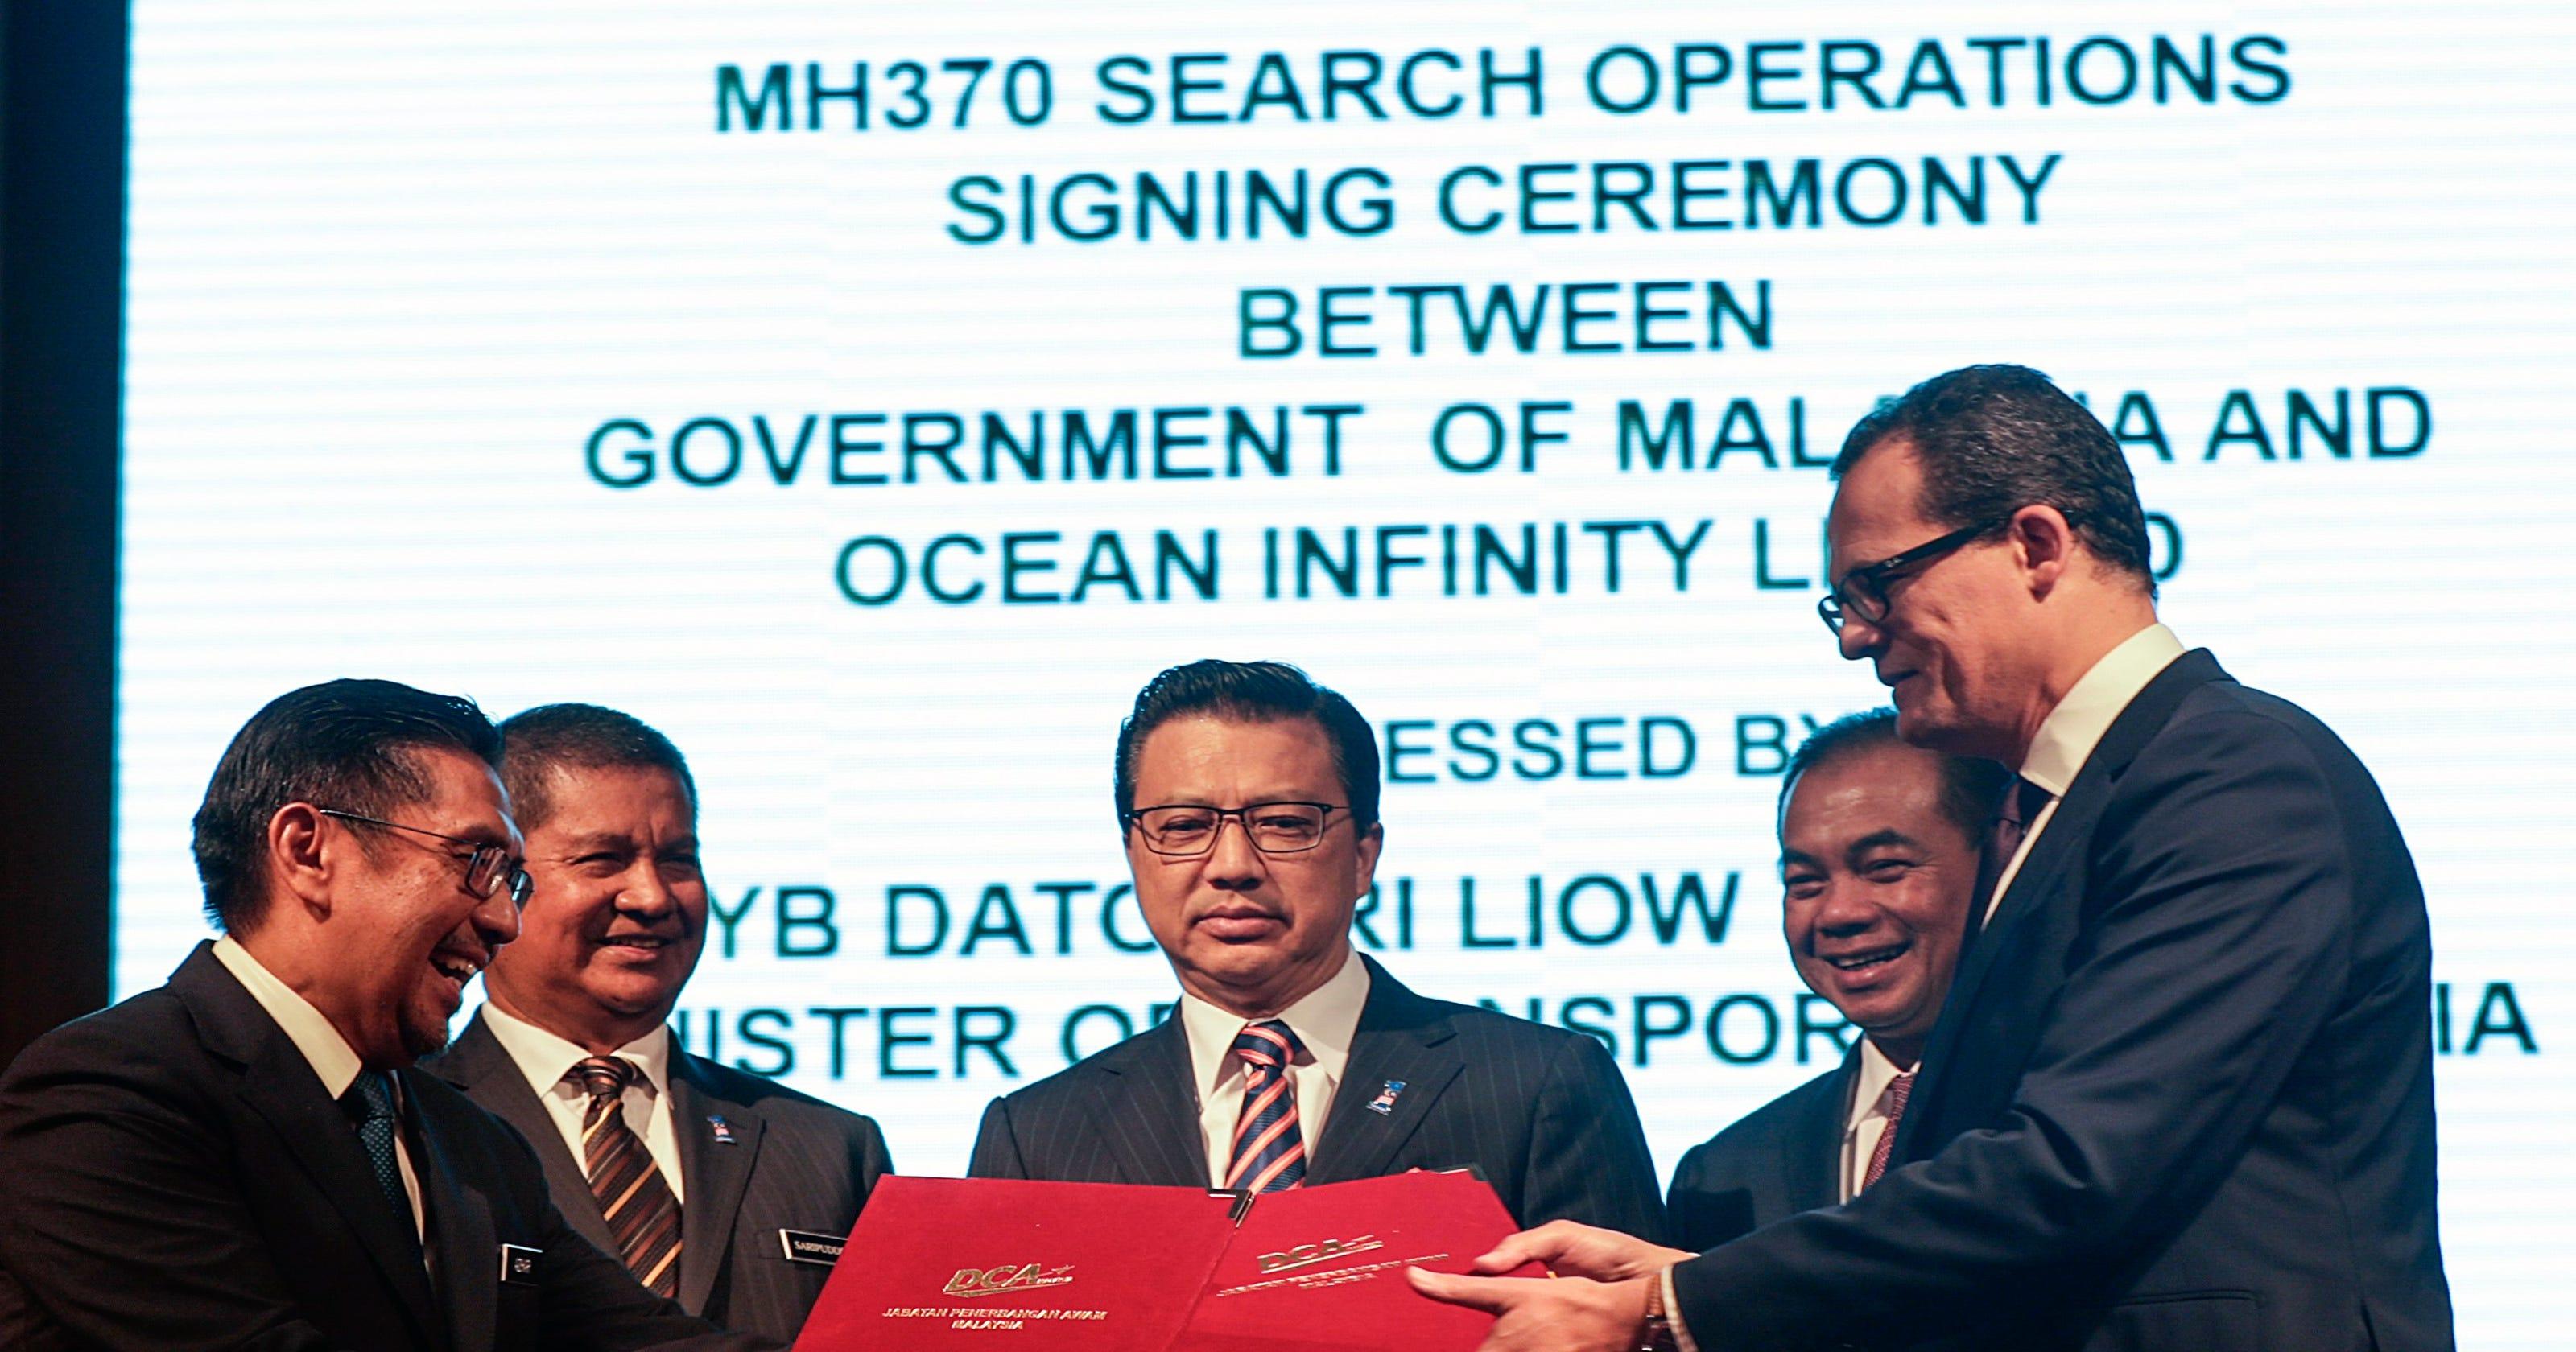 MH370 search: U S  vessel en route to new search area